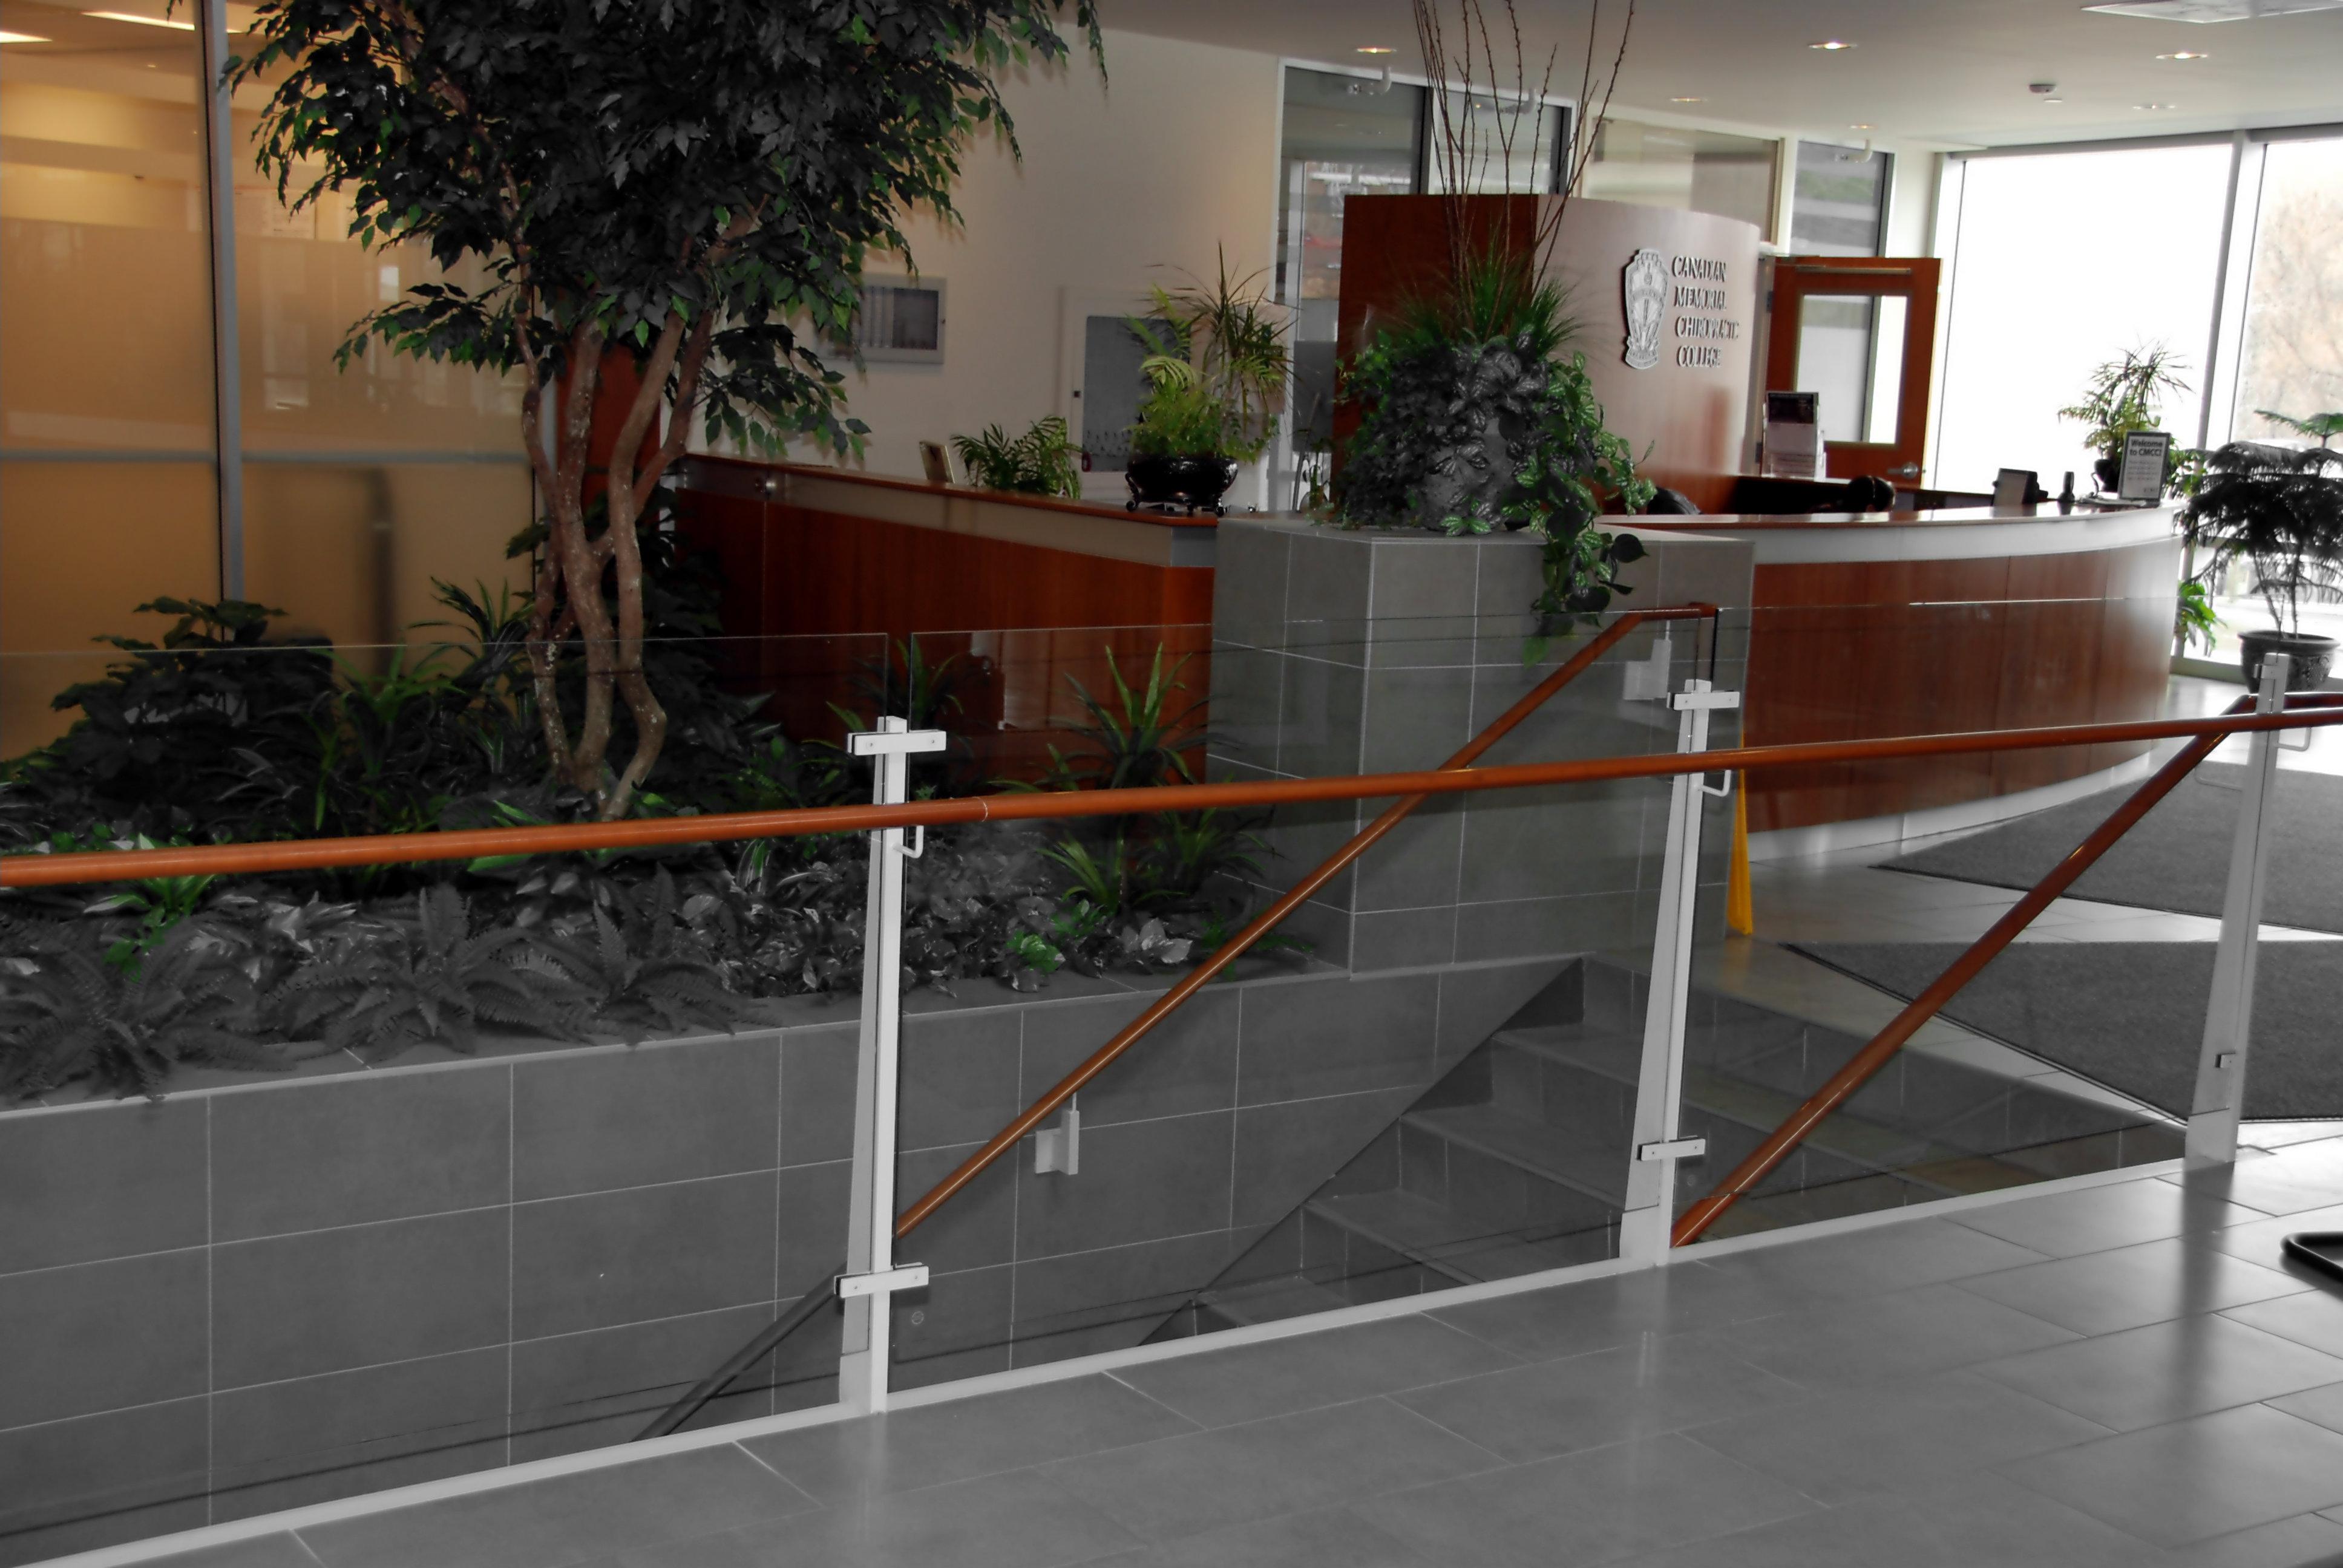 Chiropractic College Handrail